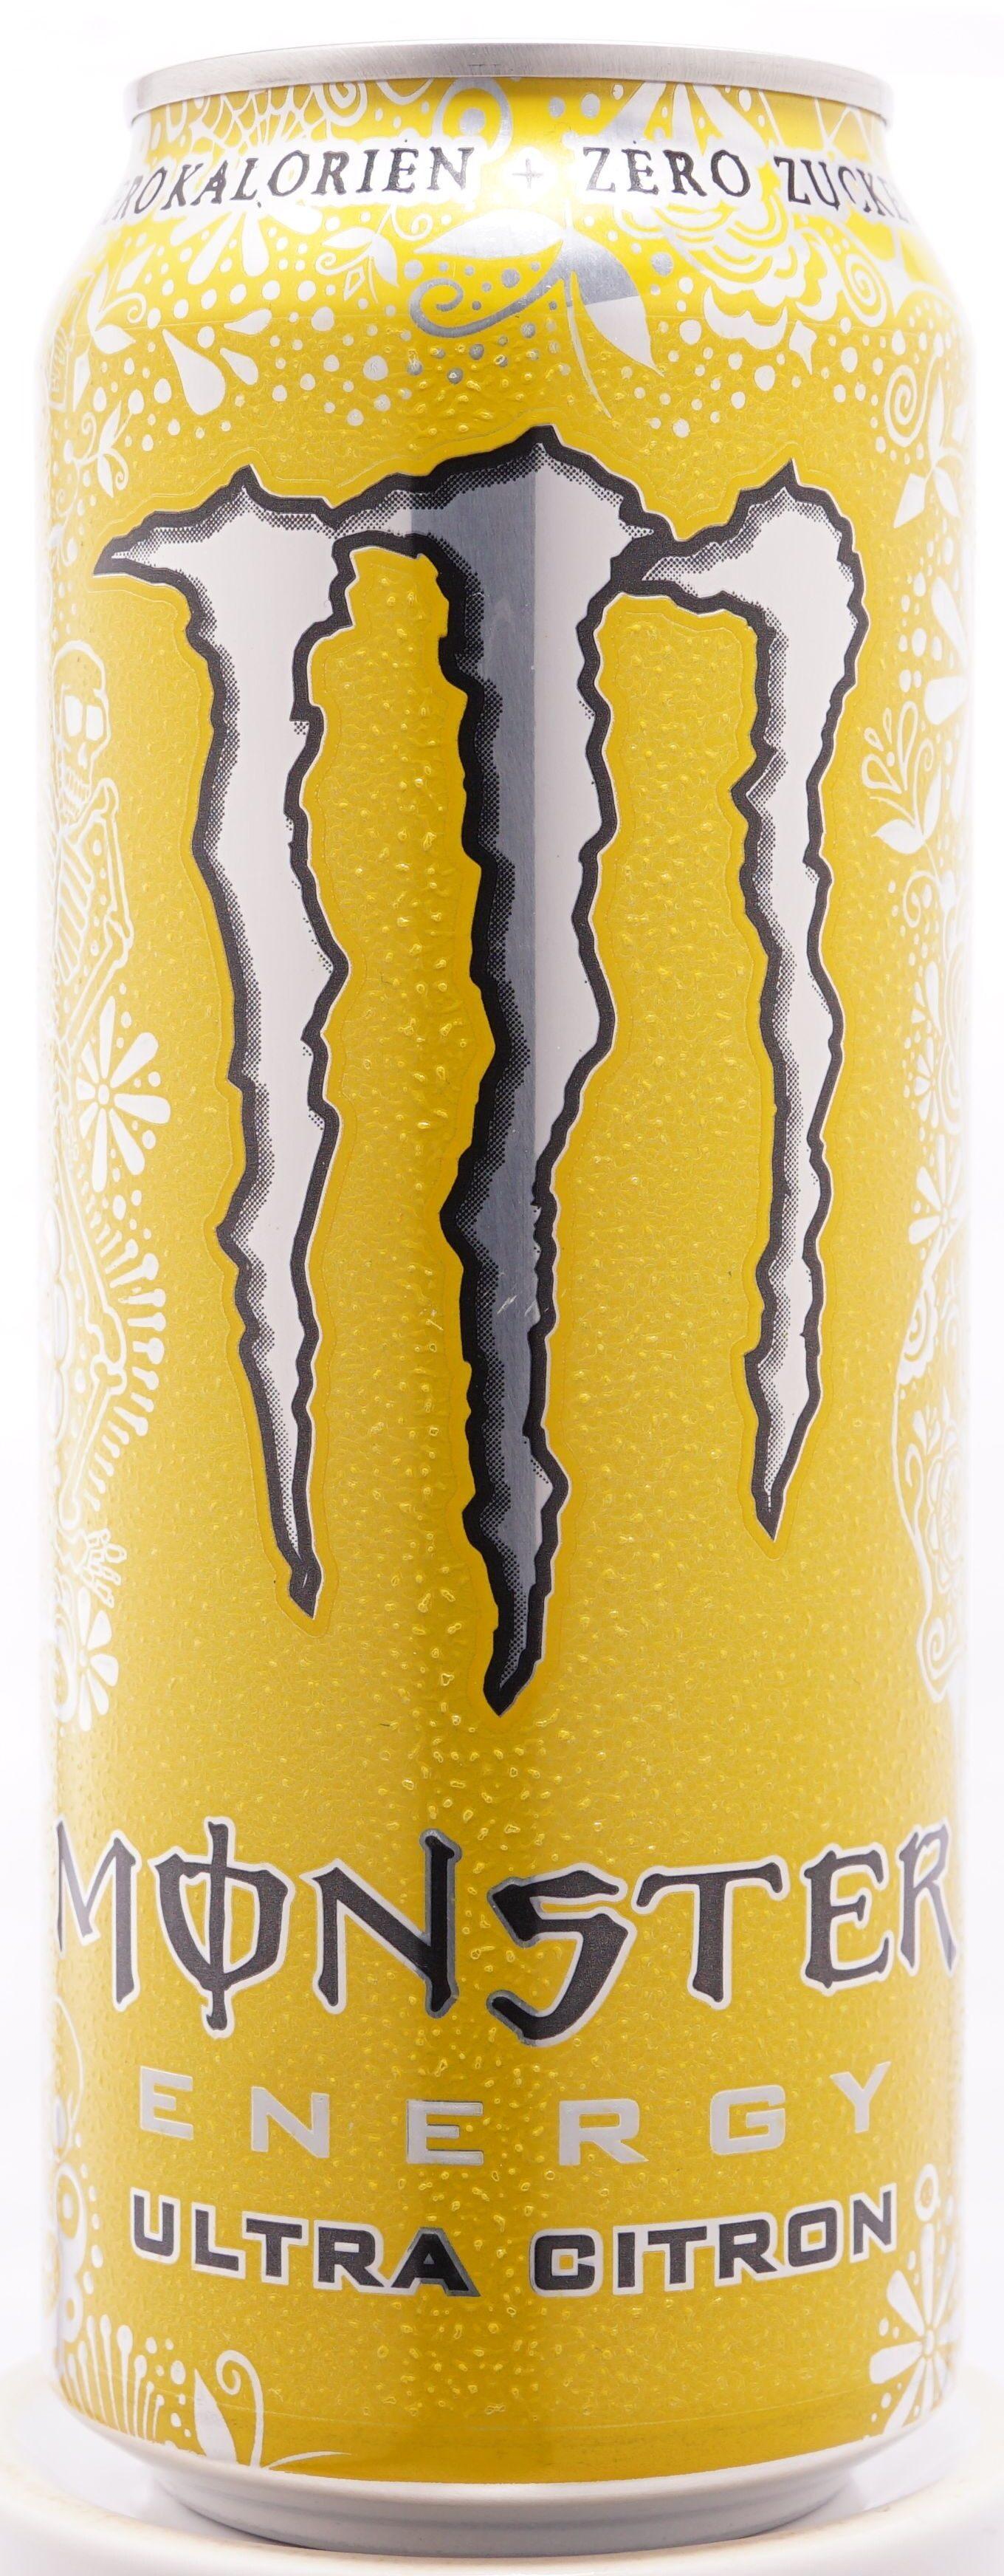 Monster Energy, Ultra Citron - Produkt - de